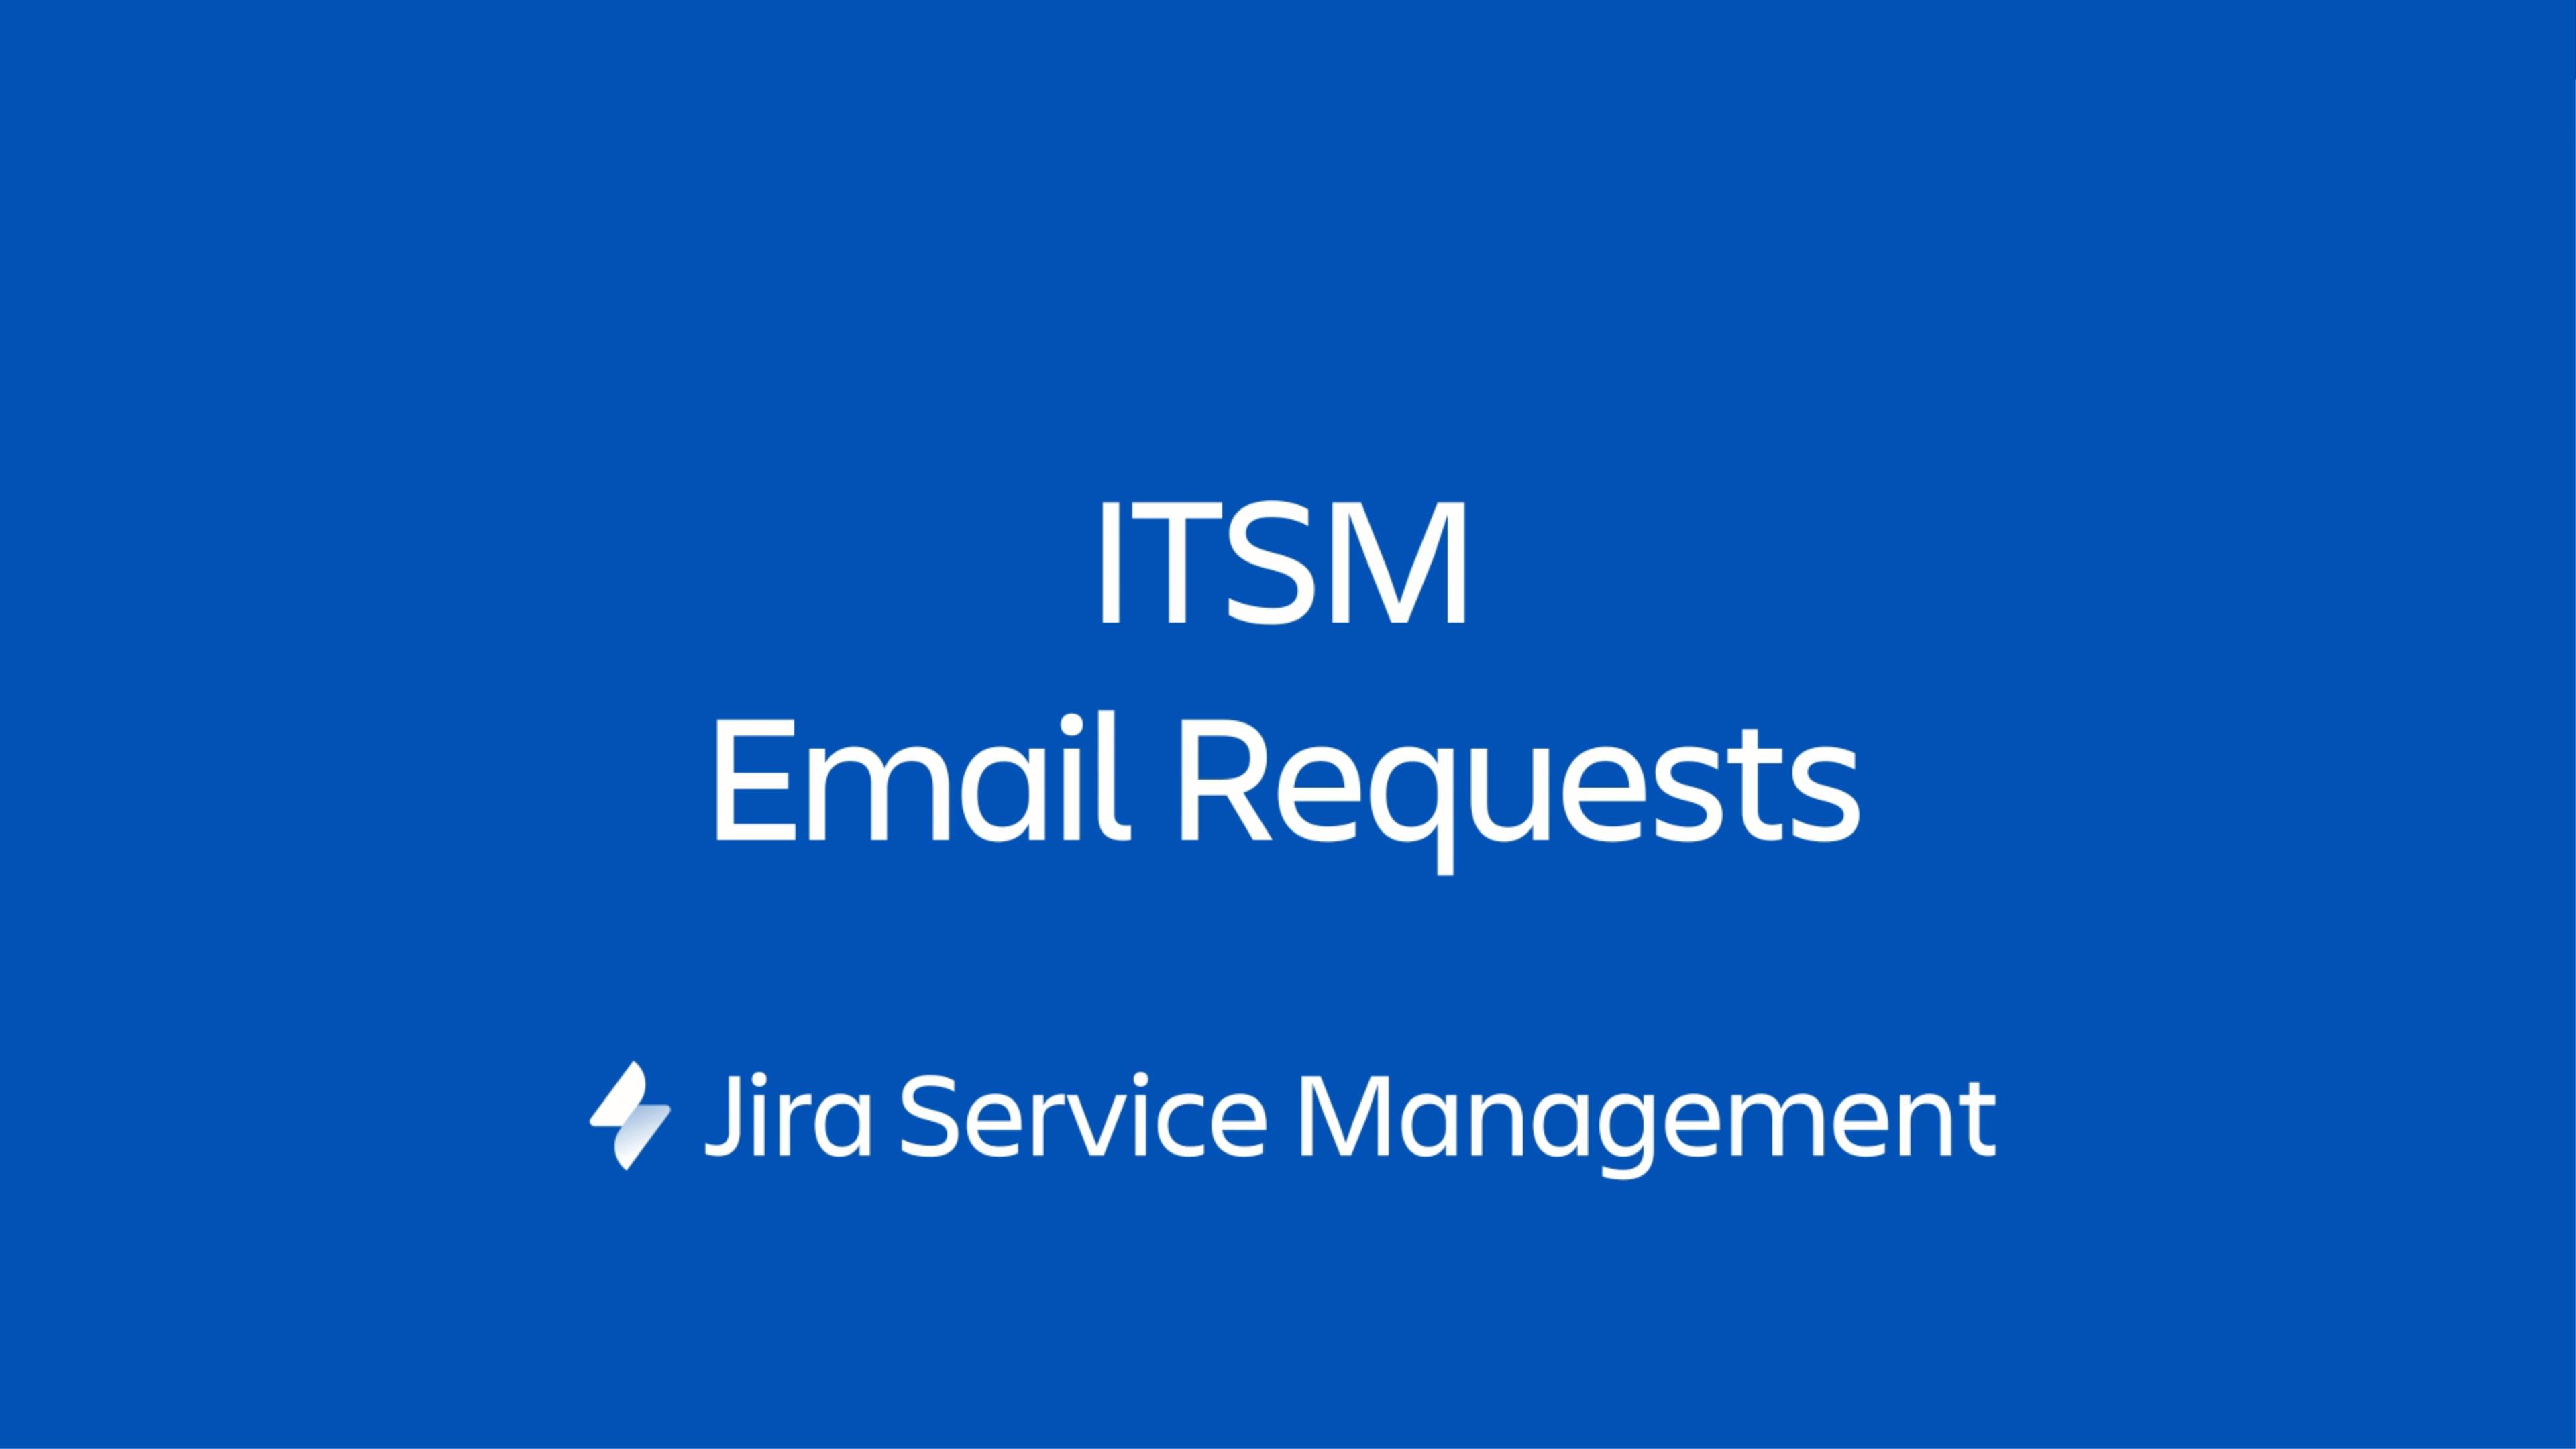 Jira Service Management에서 ITSM 이메일 요청